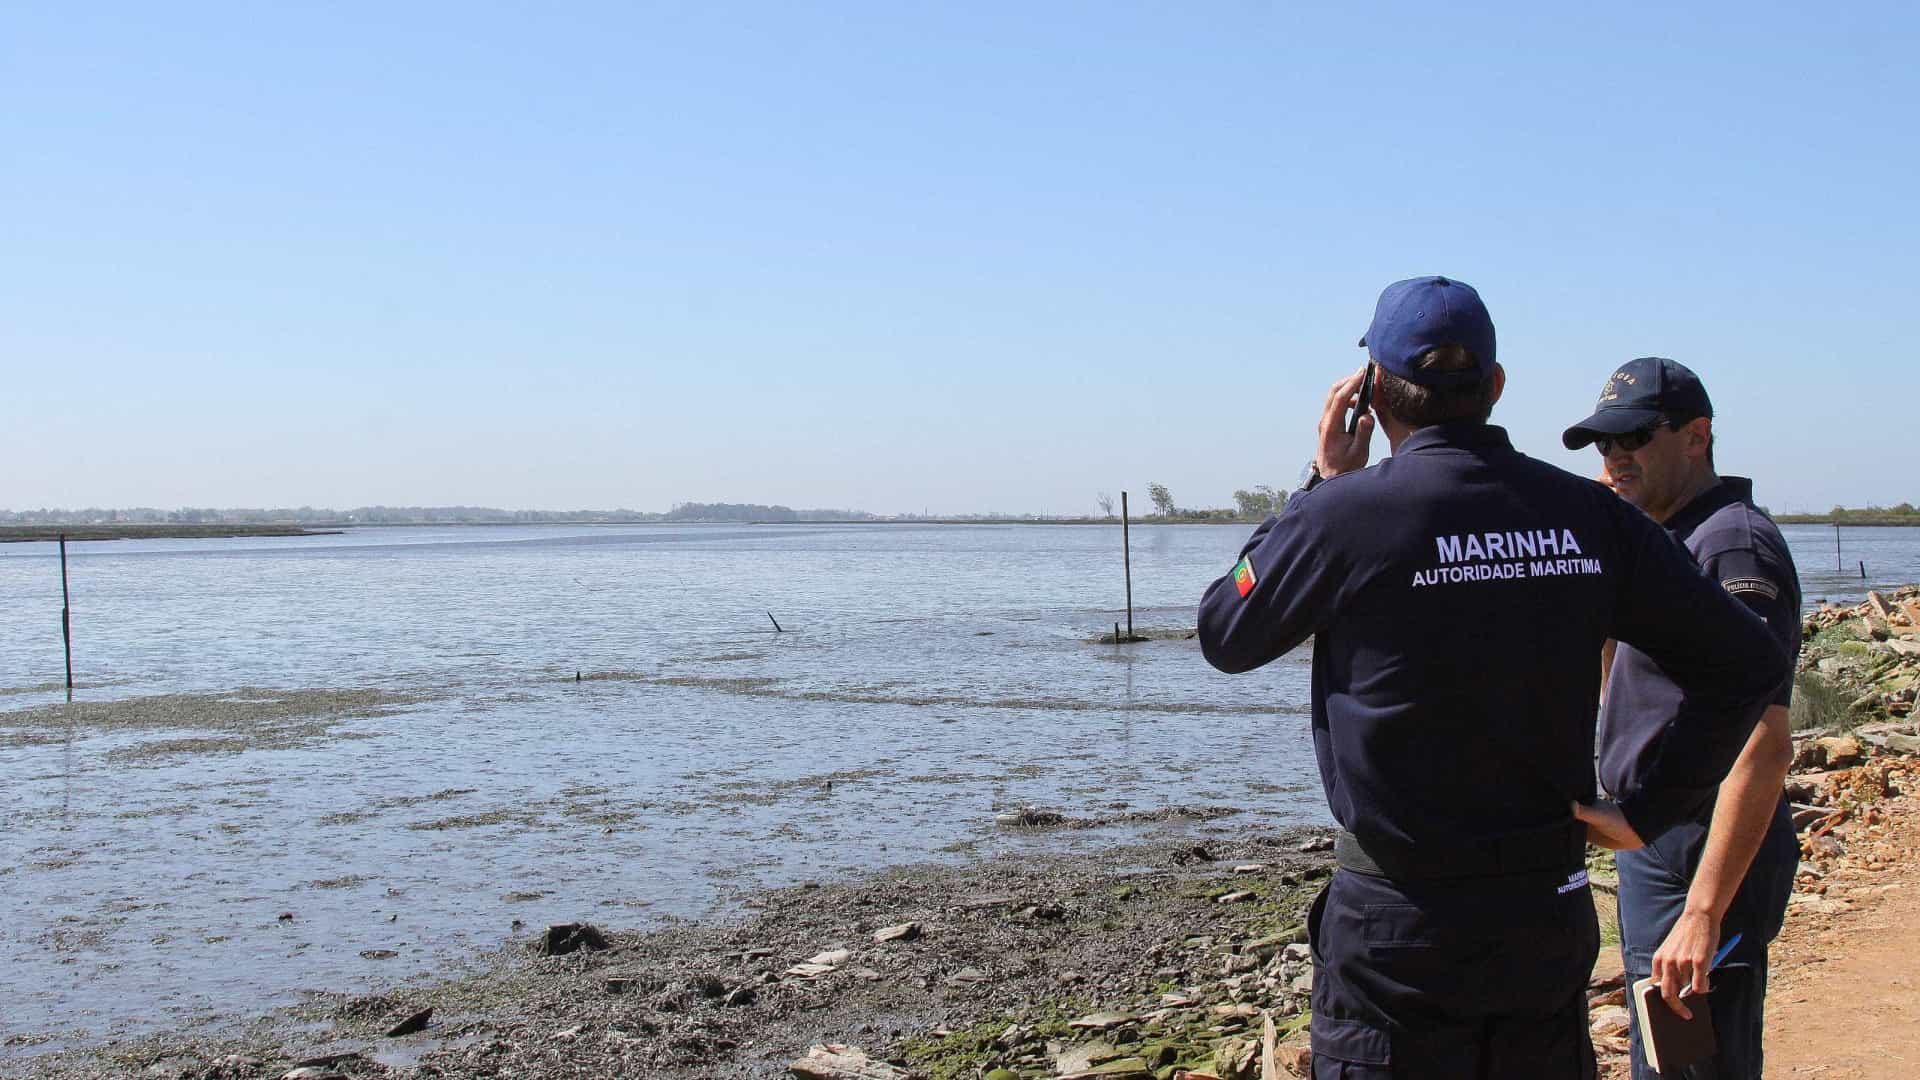 Dois velejadores alemães resgatados por helicóptero no Algarve